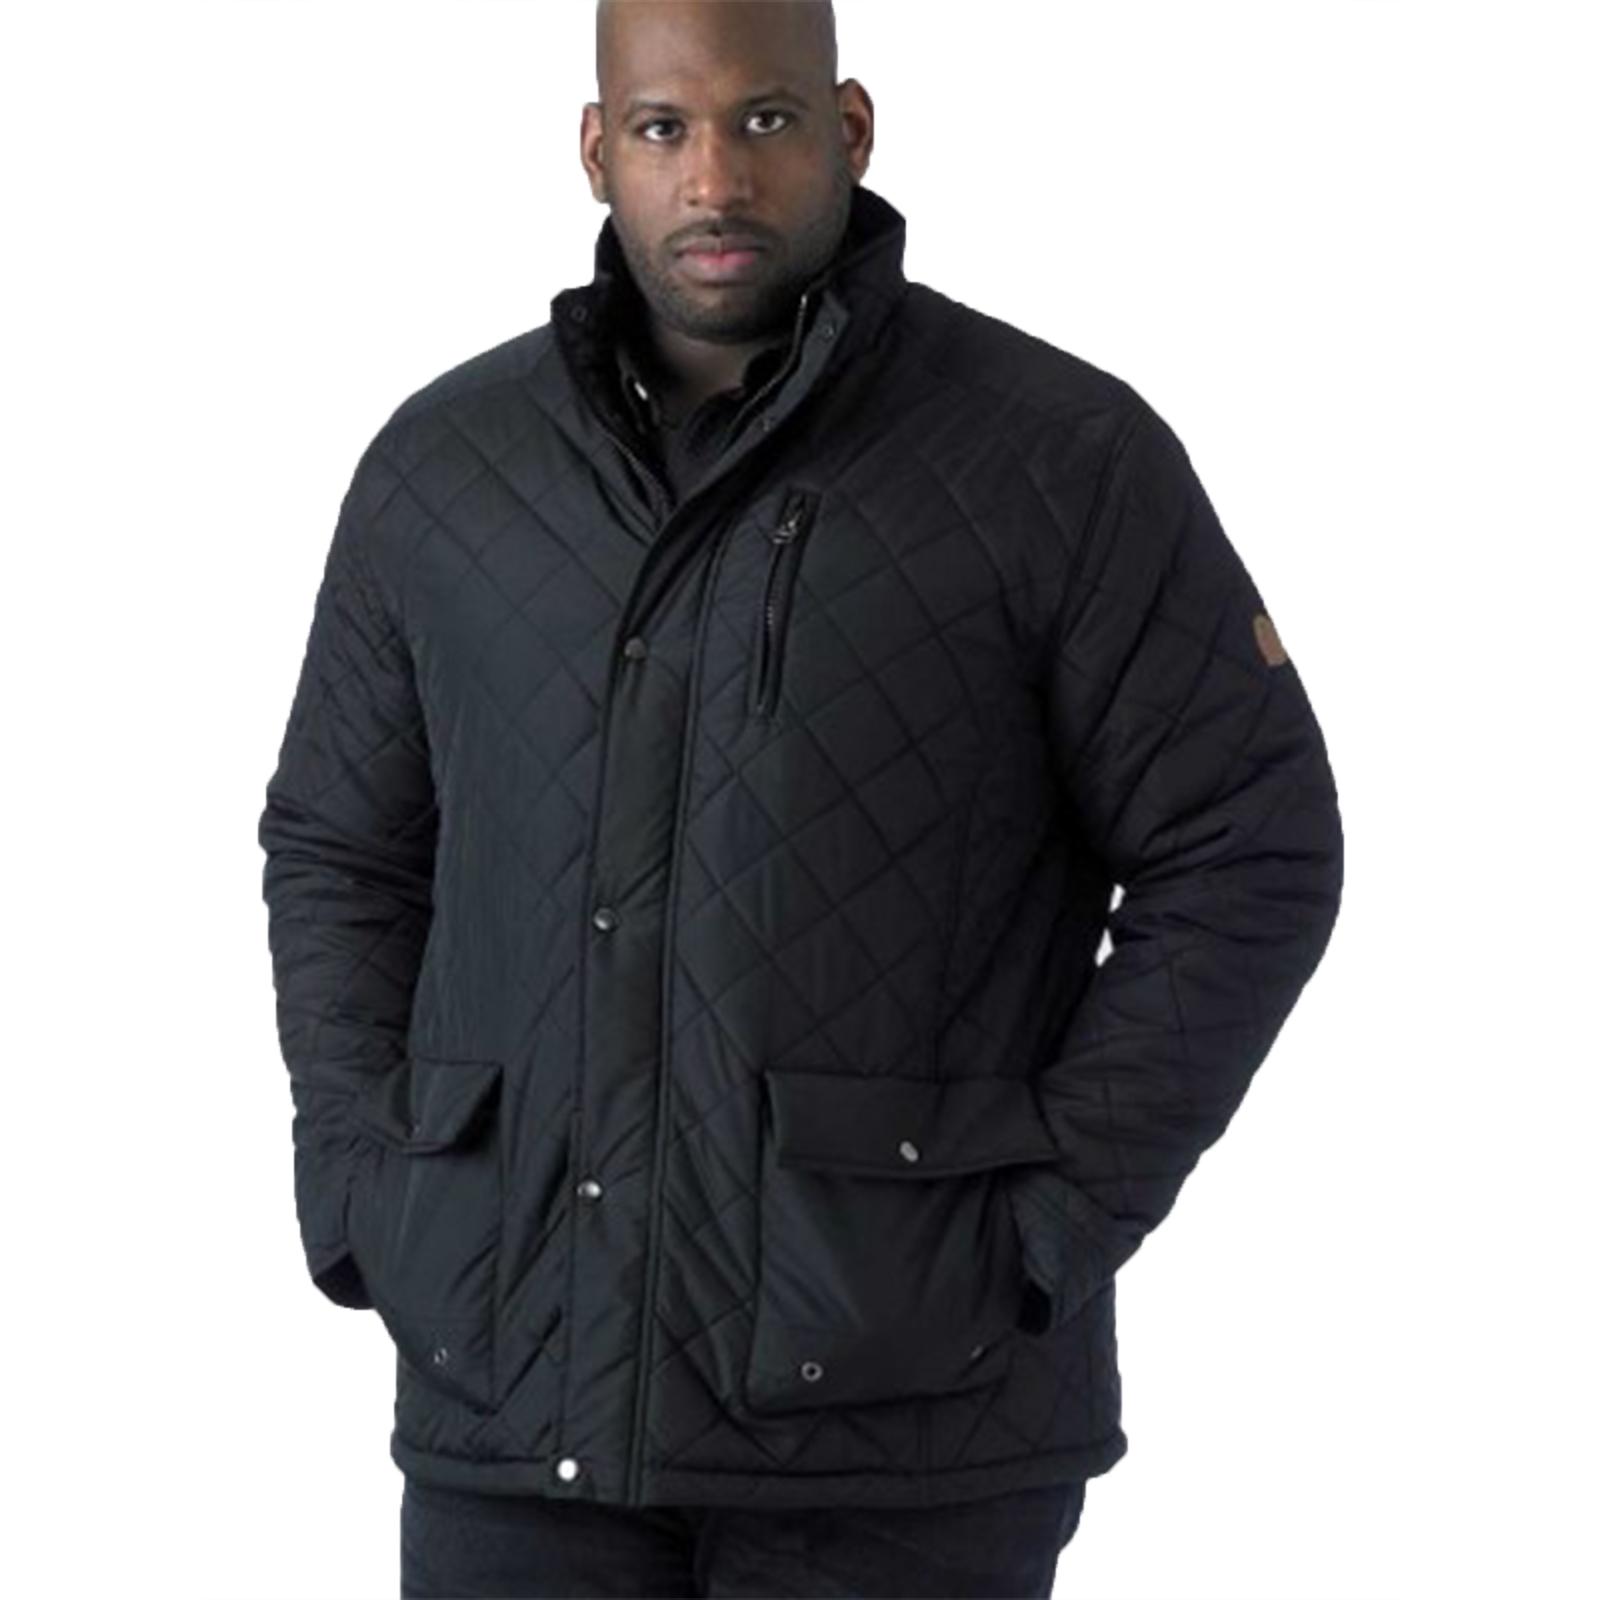 Duke D555 Big Tall King Taille Homme Designer Pollard Matelassé Chaud Veste D/'Hiver